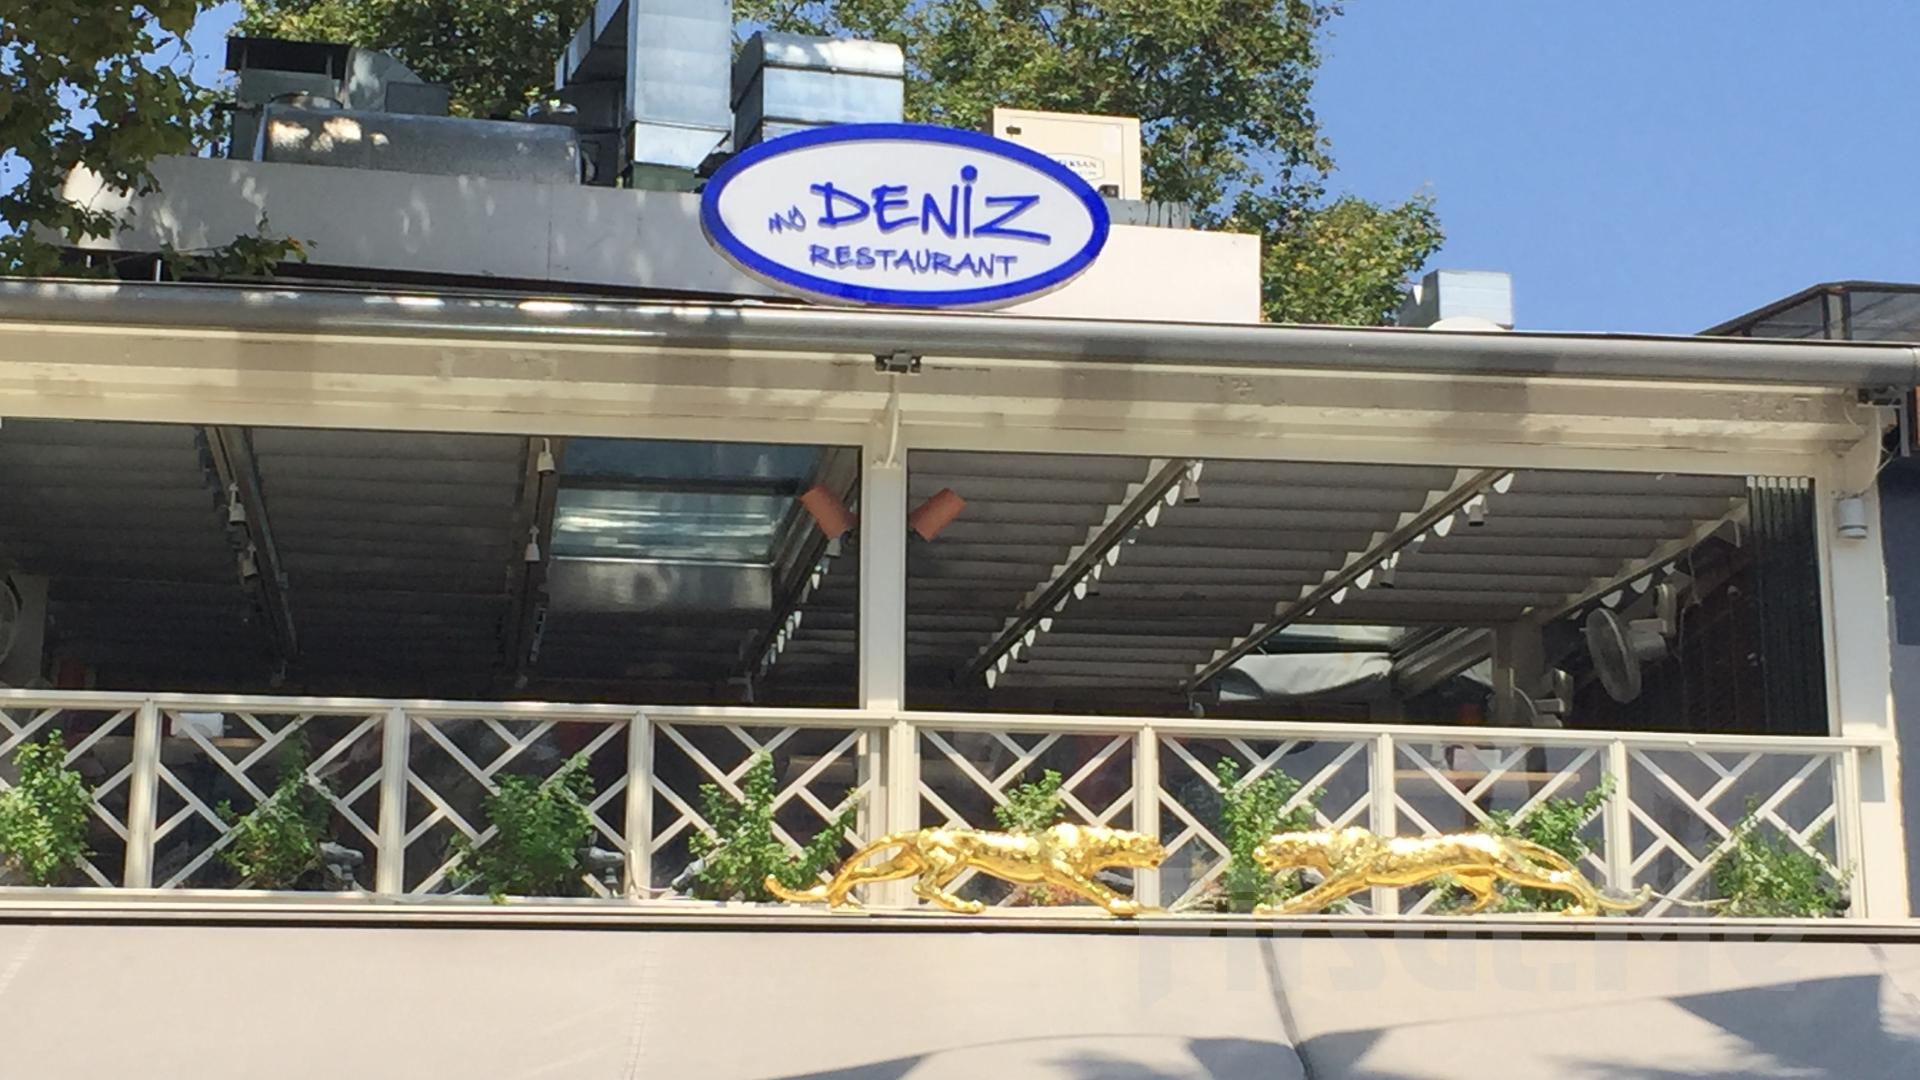 My Deniz Restaurant